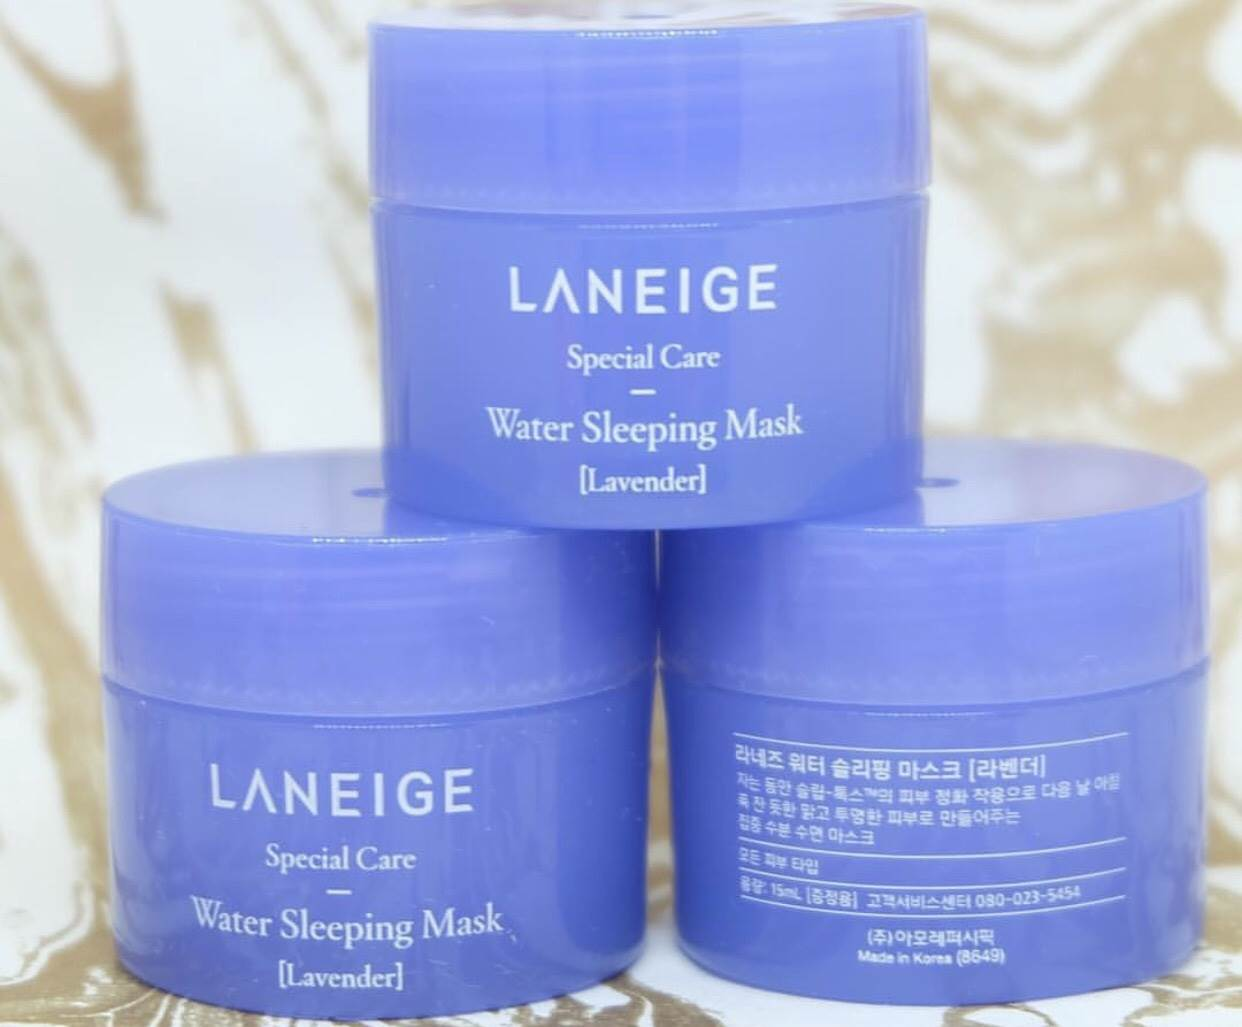 Water Sleeping Mask Lavender (Limited Edition) 15 ml เจลใสมาส์กหน้ากลิ่นลาเวนเดอร์ สำหรับทุกสภาพผิว แบบไม่ต้องล้างออก เนื้อเจลเย็นๆ บางเบาซึมซาบเร็ว พร้อมกลิ่นหอมที่ถูกคิดค้นเป็นพิเศษ มอบความรู้สึกผ่อนคลายสบายผิว เข้าเติมน้ำให้ผิวขณะหลับอย่างล้ำลึก ตื่นรั